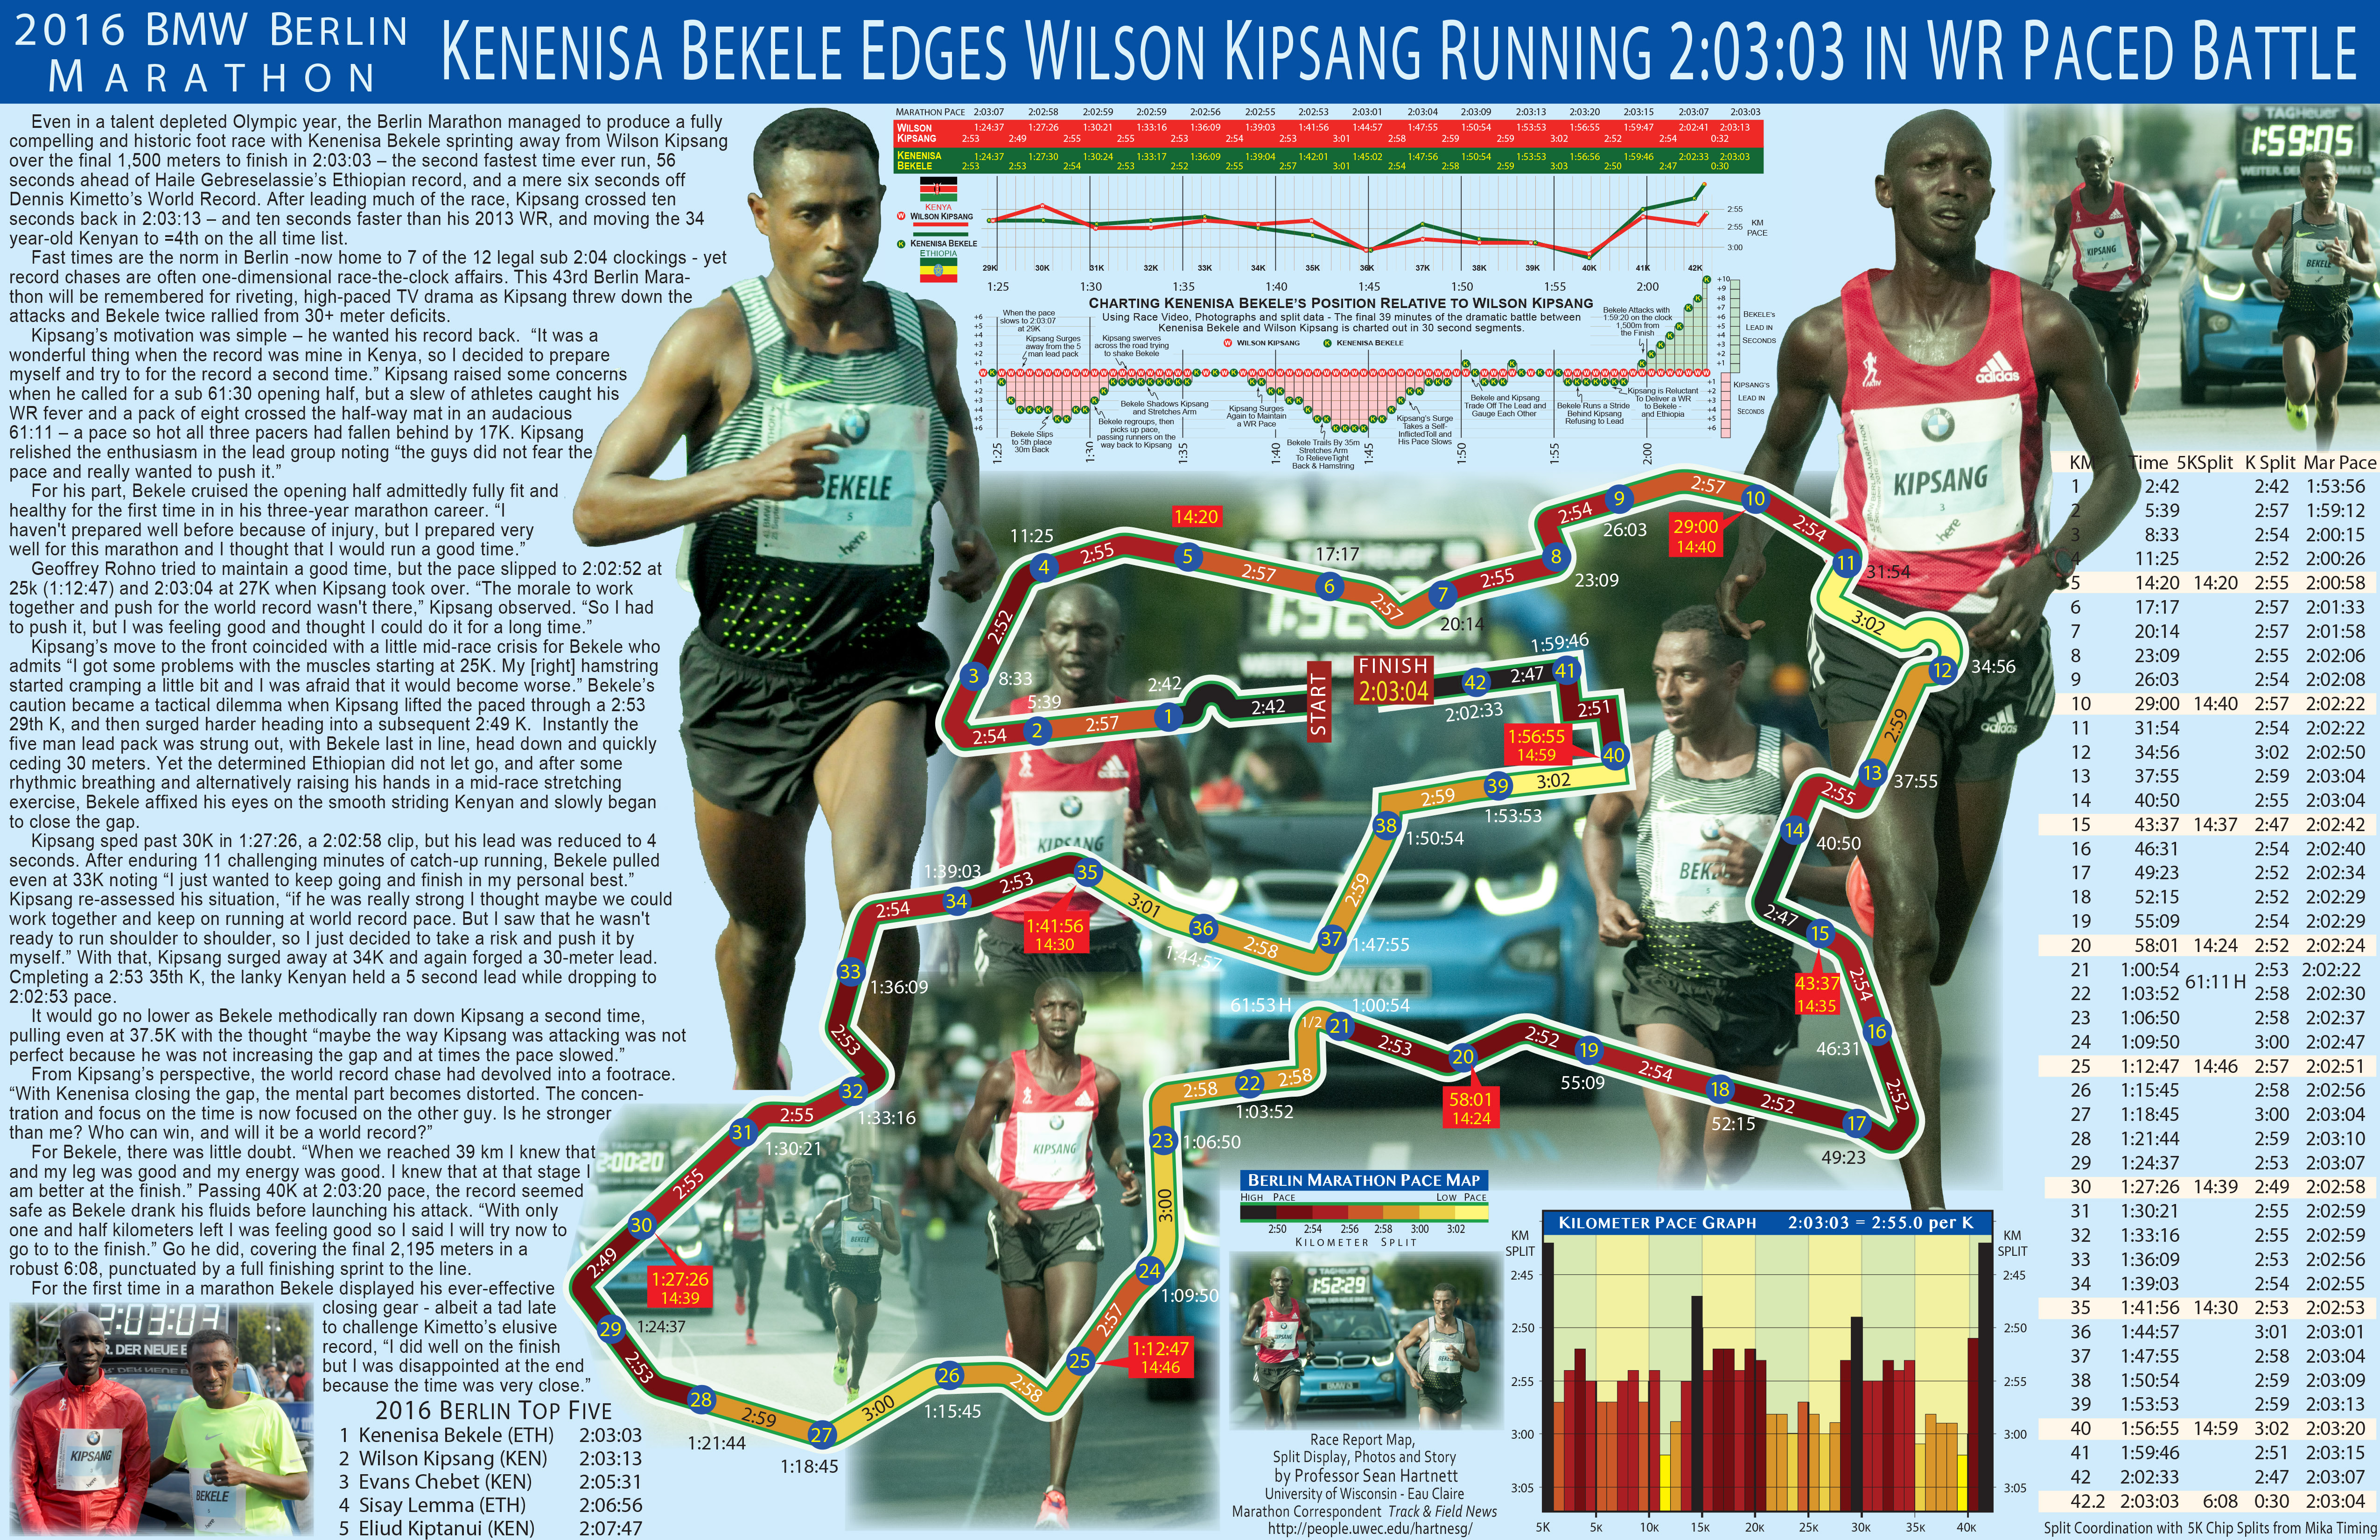 Prof Sean Hartnett Guide To Three Fastest Marathons